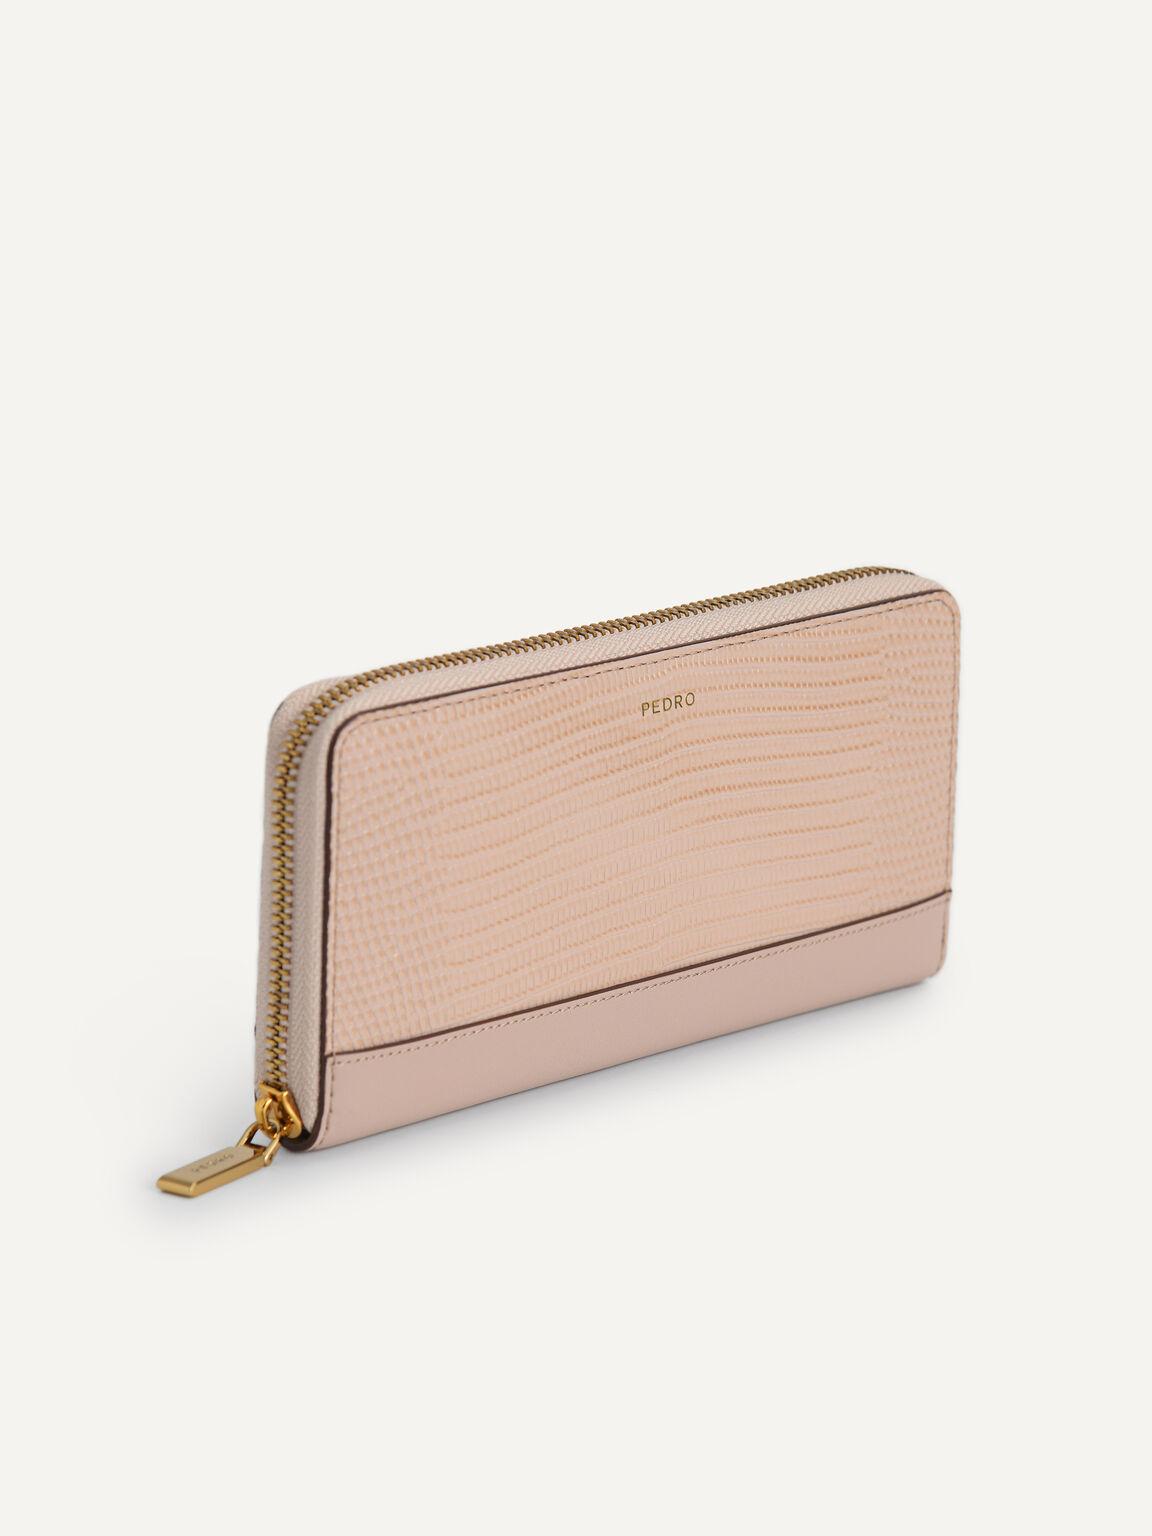 Lizard-Effect Leather Wallet, Nude, hi-res